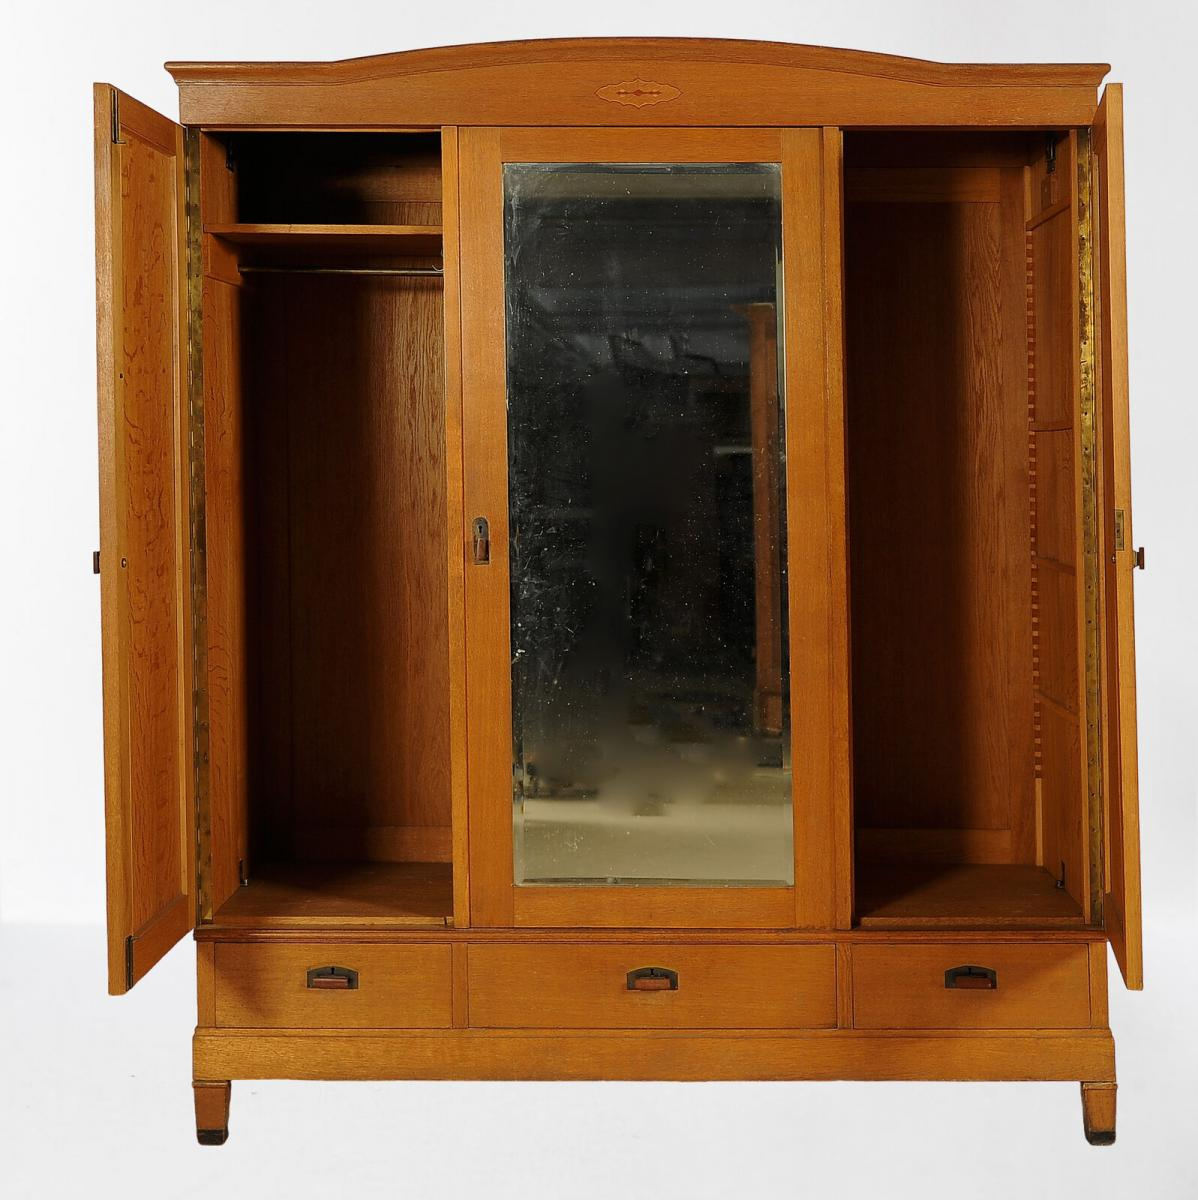 Großer dreitüriger Jugendstil Kleiderschrank aus Eichenholz Antik Kolosseum 2